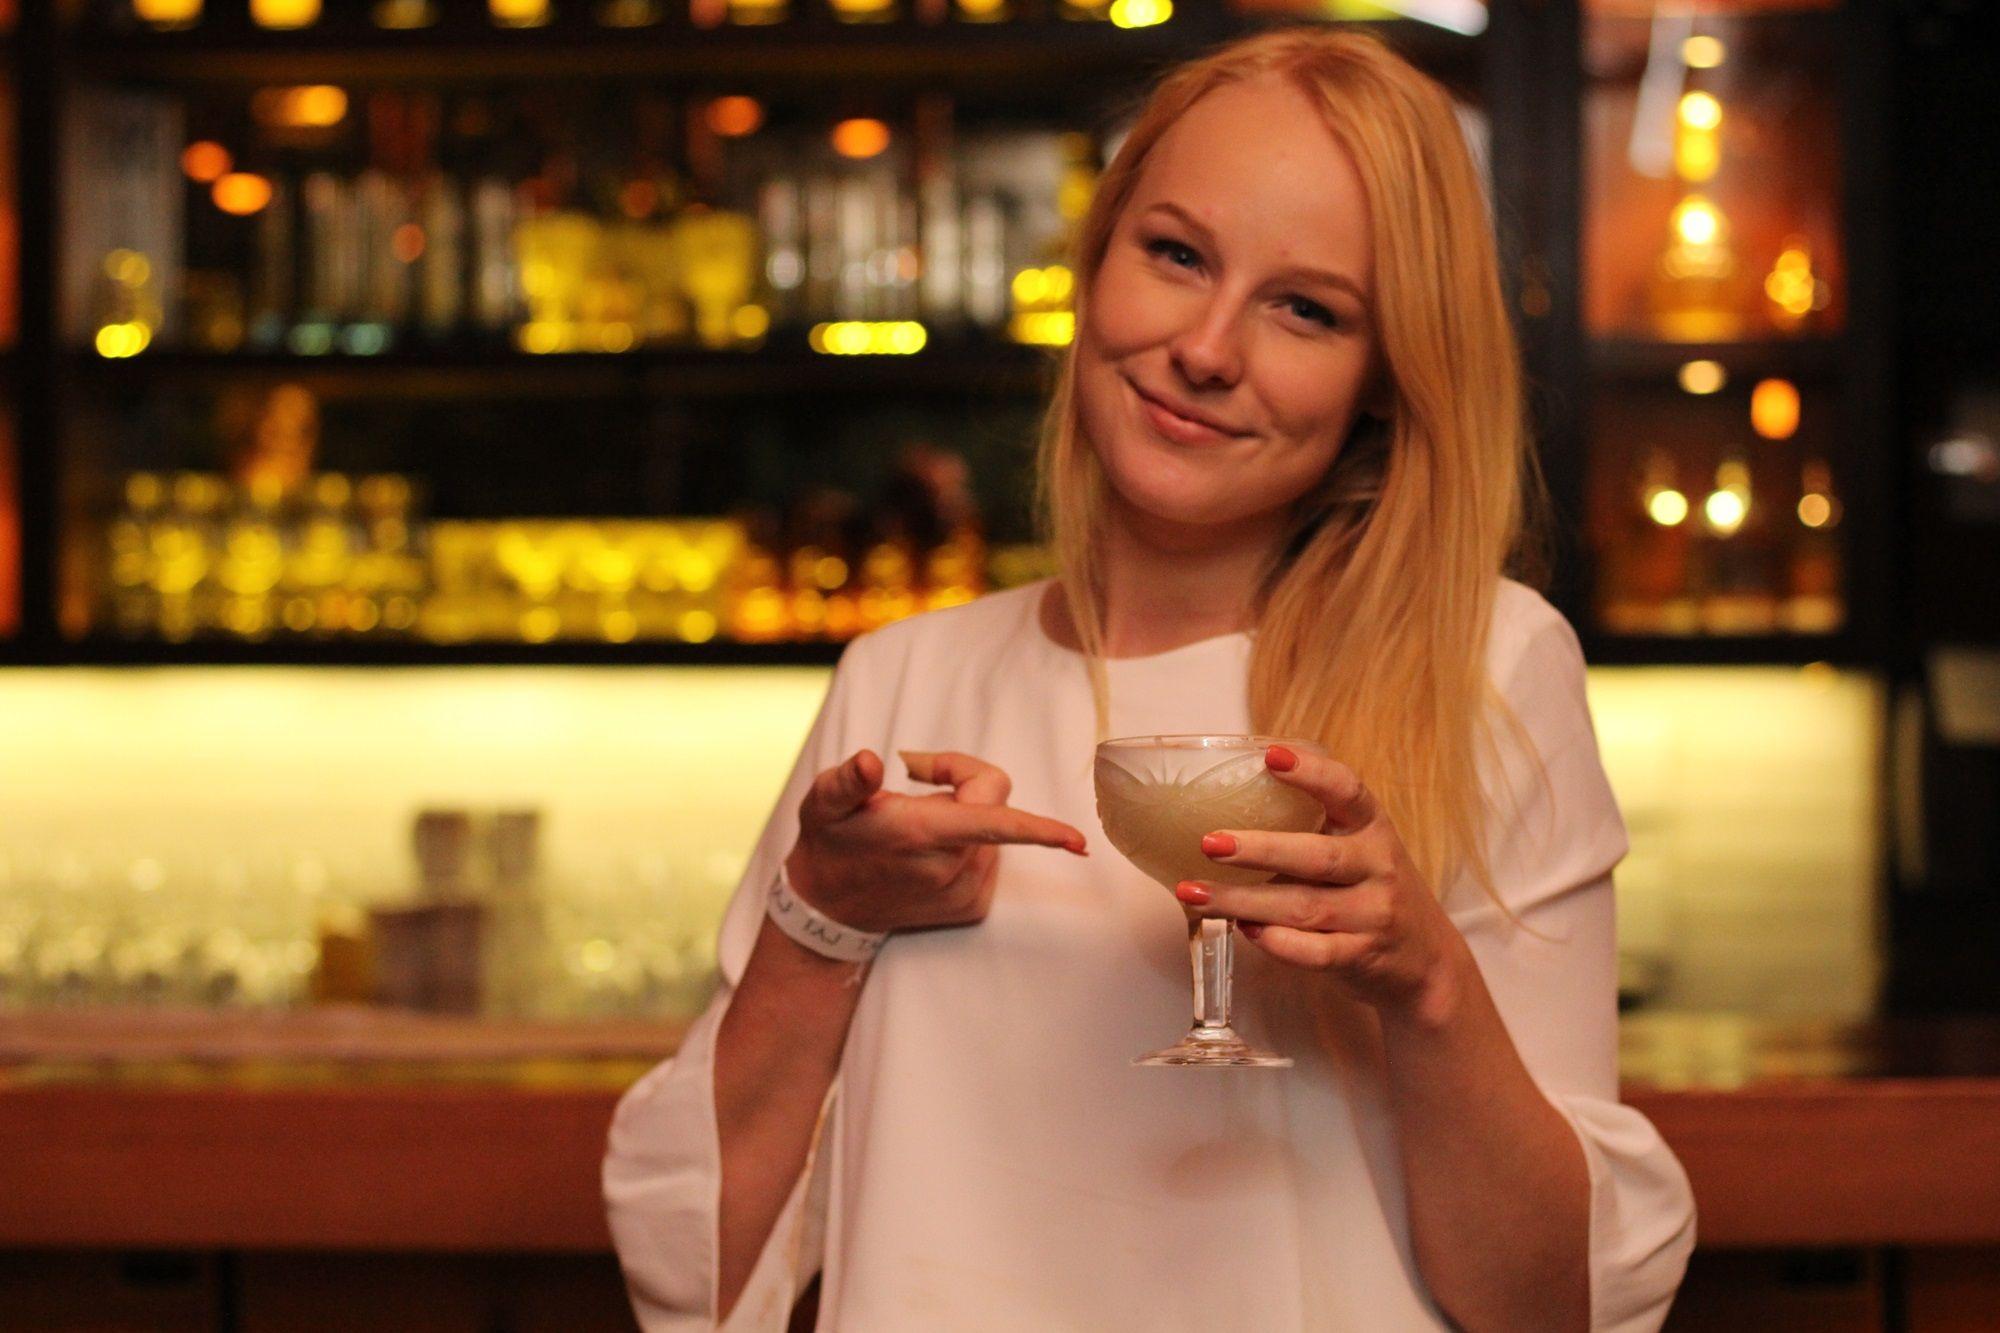 Youtuber holandesa Nienke Helthuis conhece a noite curitibana